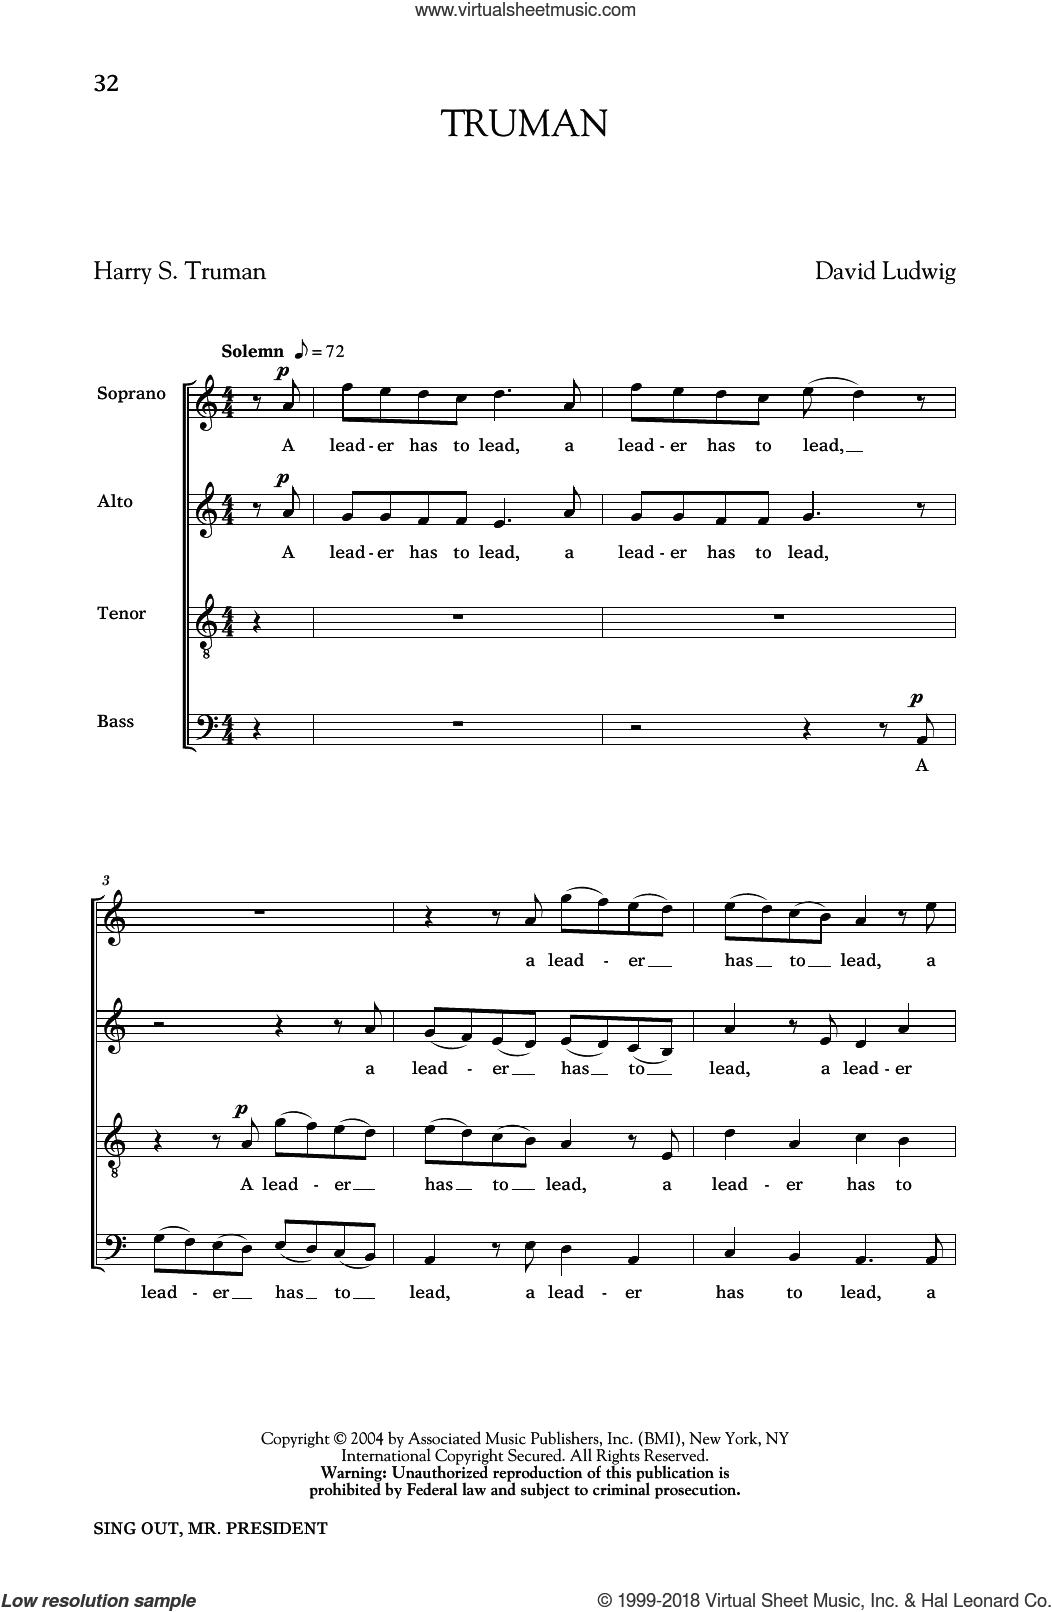 Truman sheet music for choir by David Ludwig and Harry Truman, intermediate skill level